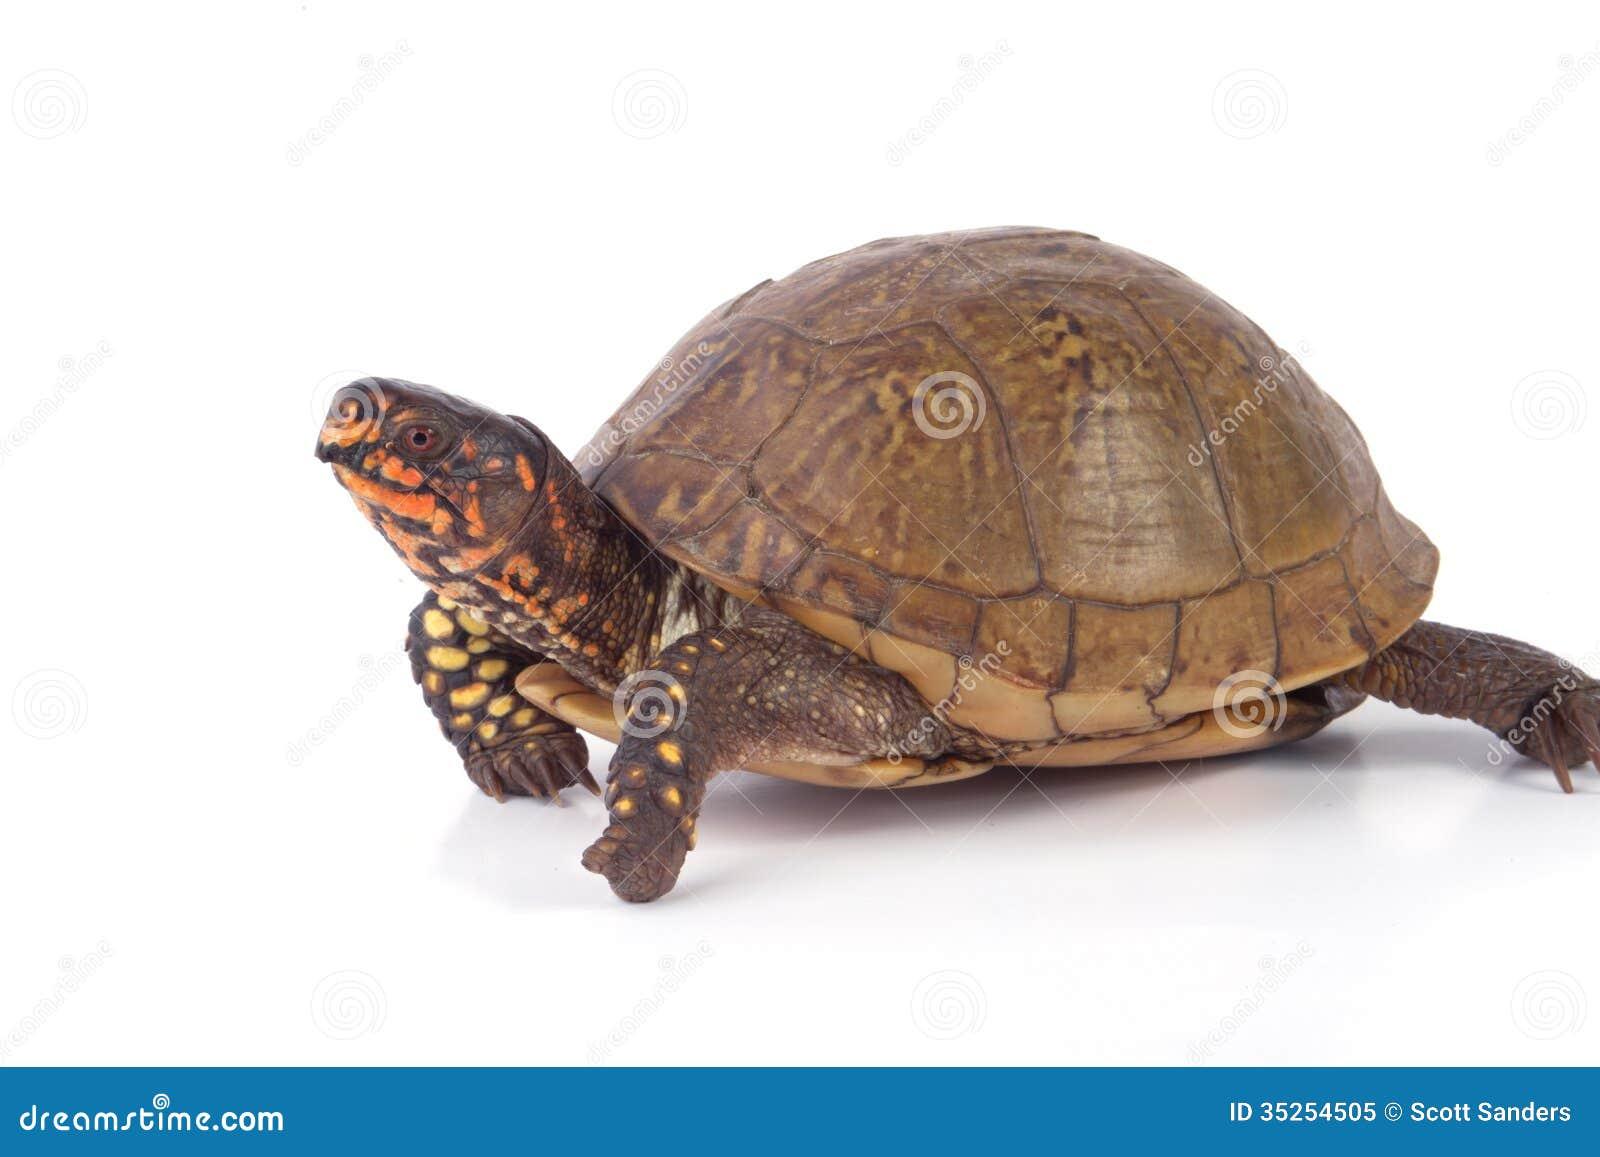 box turtle royalty free stock photo image 35254505